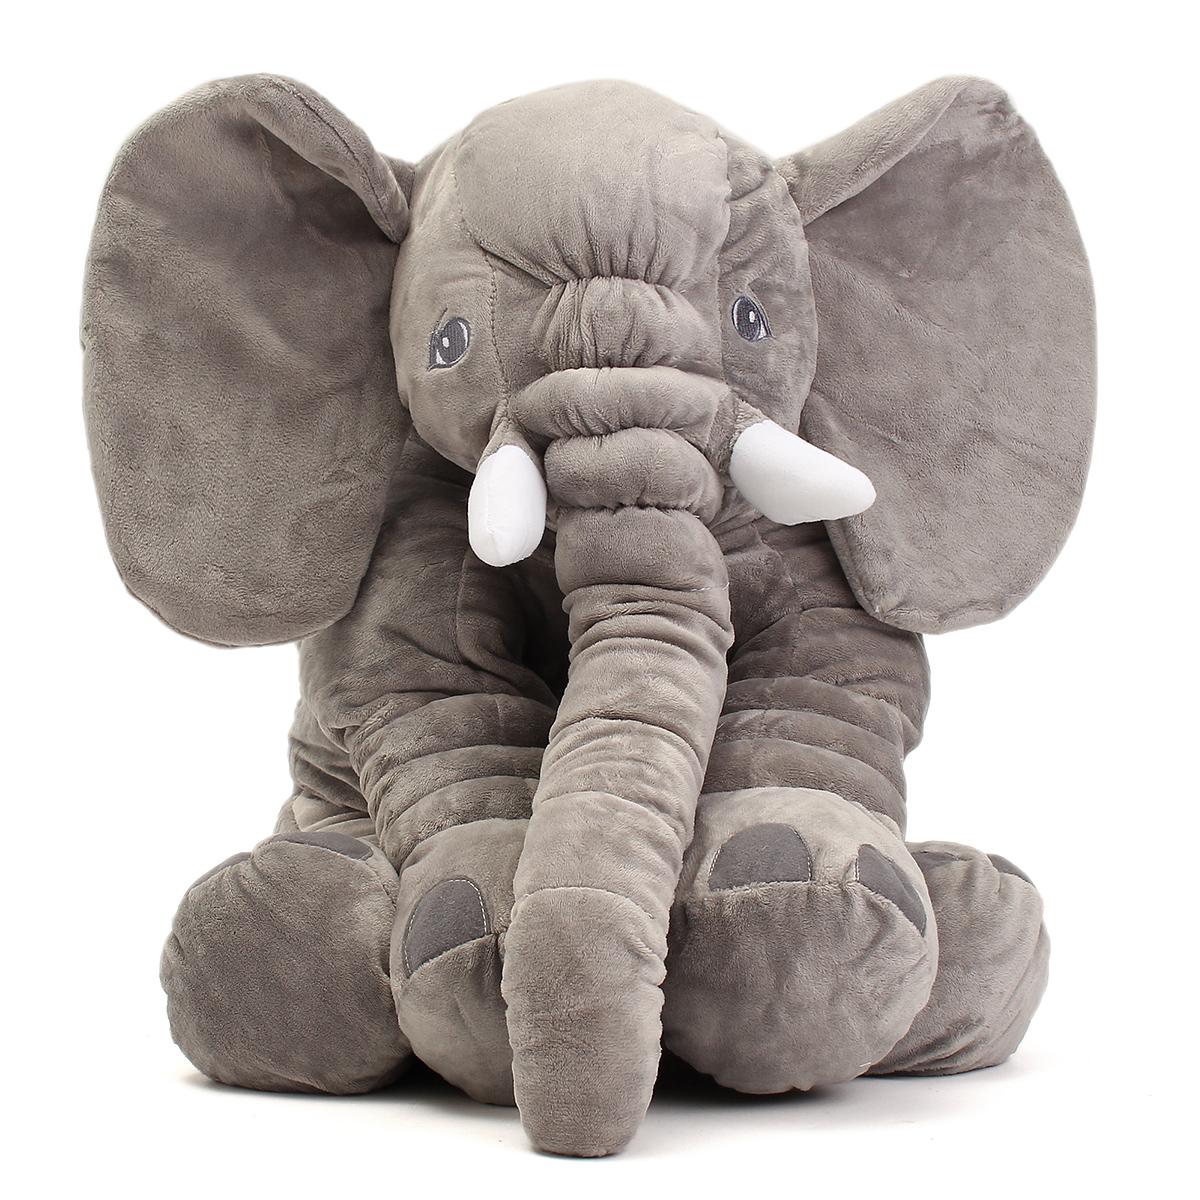 Elephant Stuffed Toy : ″ cm cute jumbo elephant plush doll stuffed animal